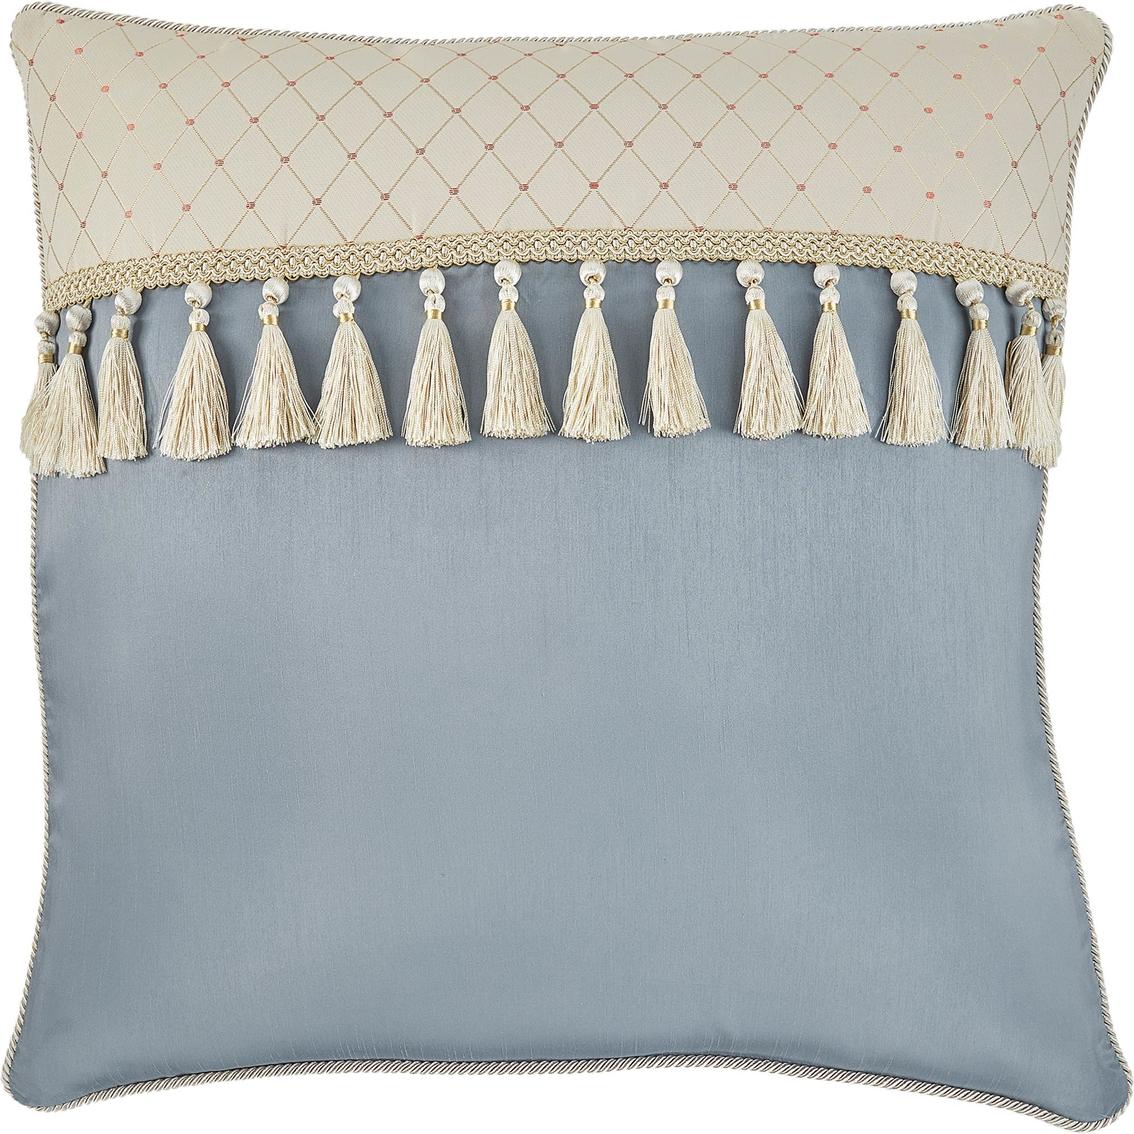 croscill carlotta european sham sheets pillowcases household shop the exchange